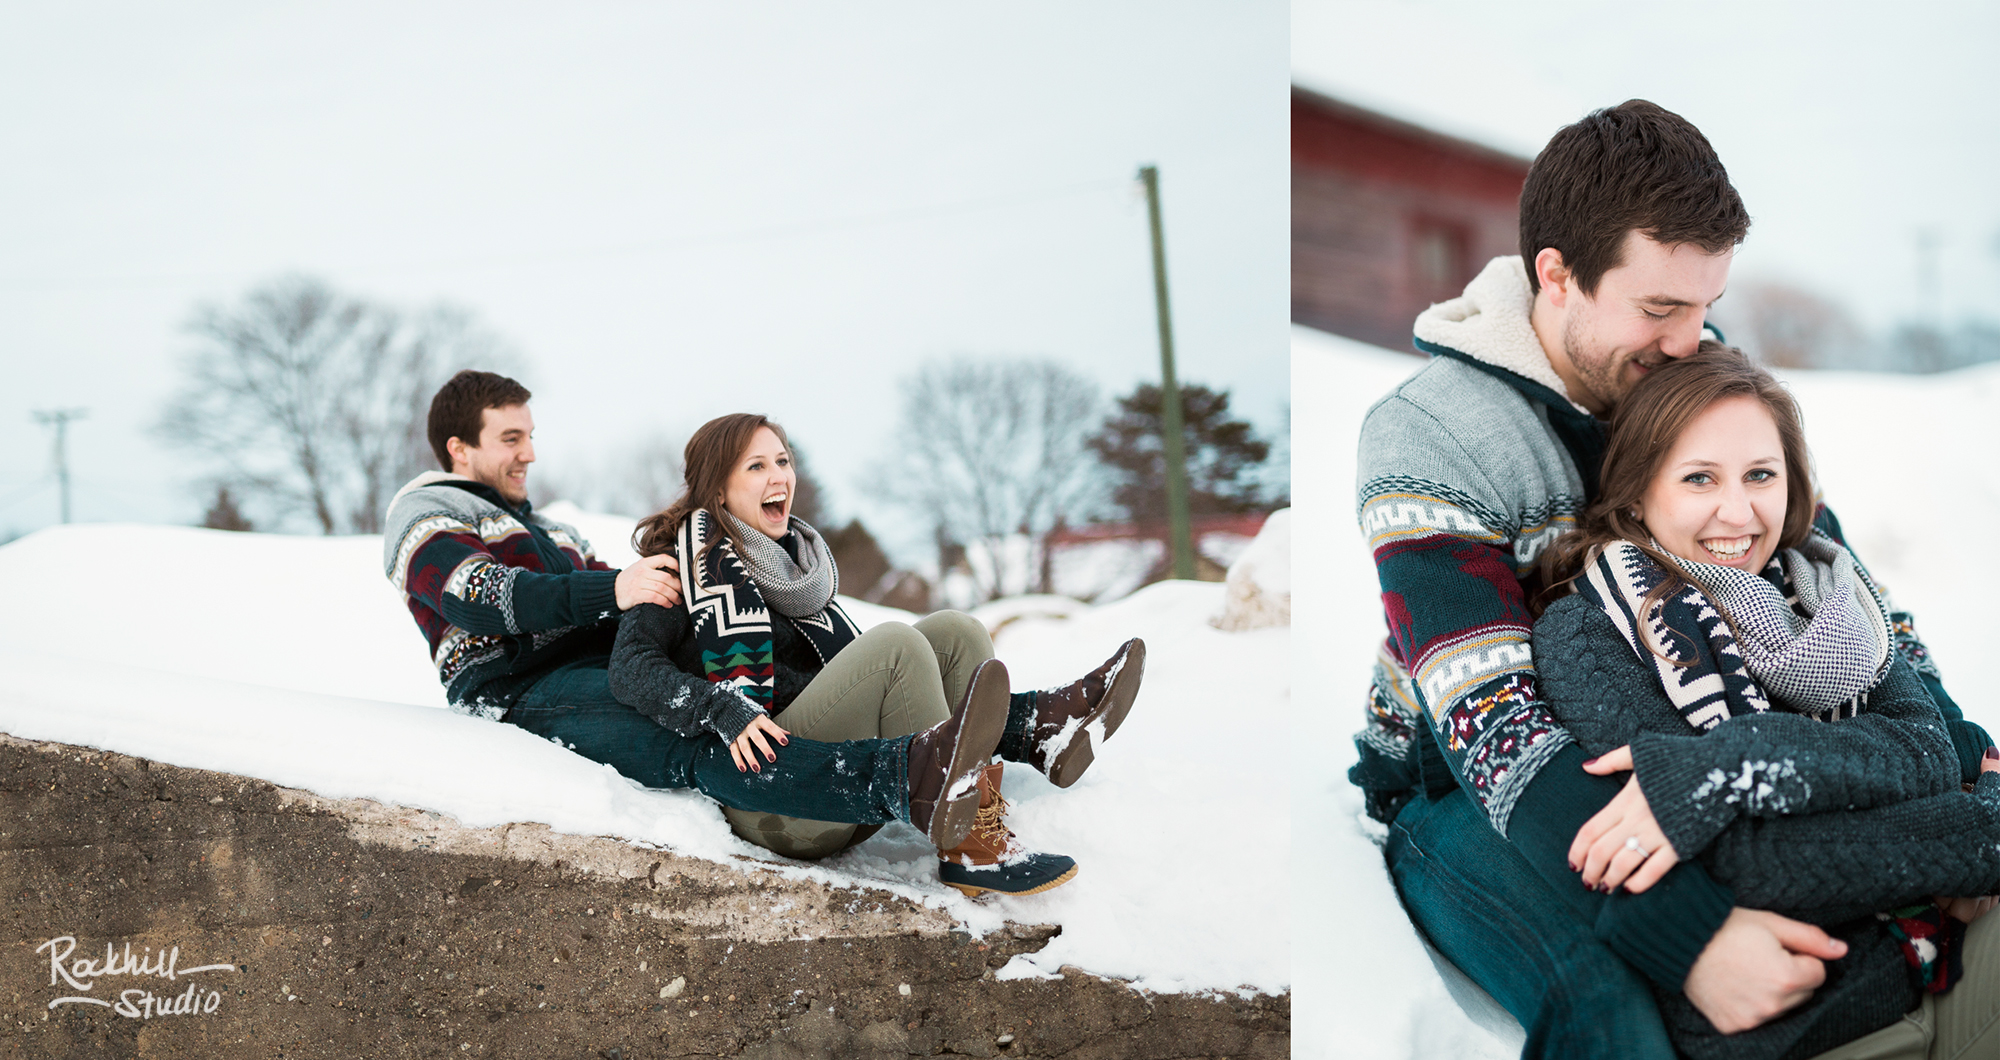 rockhill-studio-northern-michigan-engagement-photography-upper-peninsula-marquette-wedding-winter-31.jpg